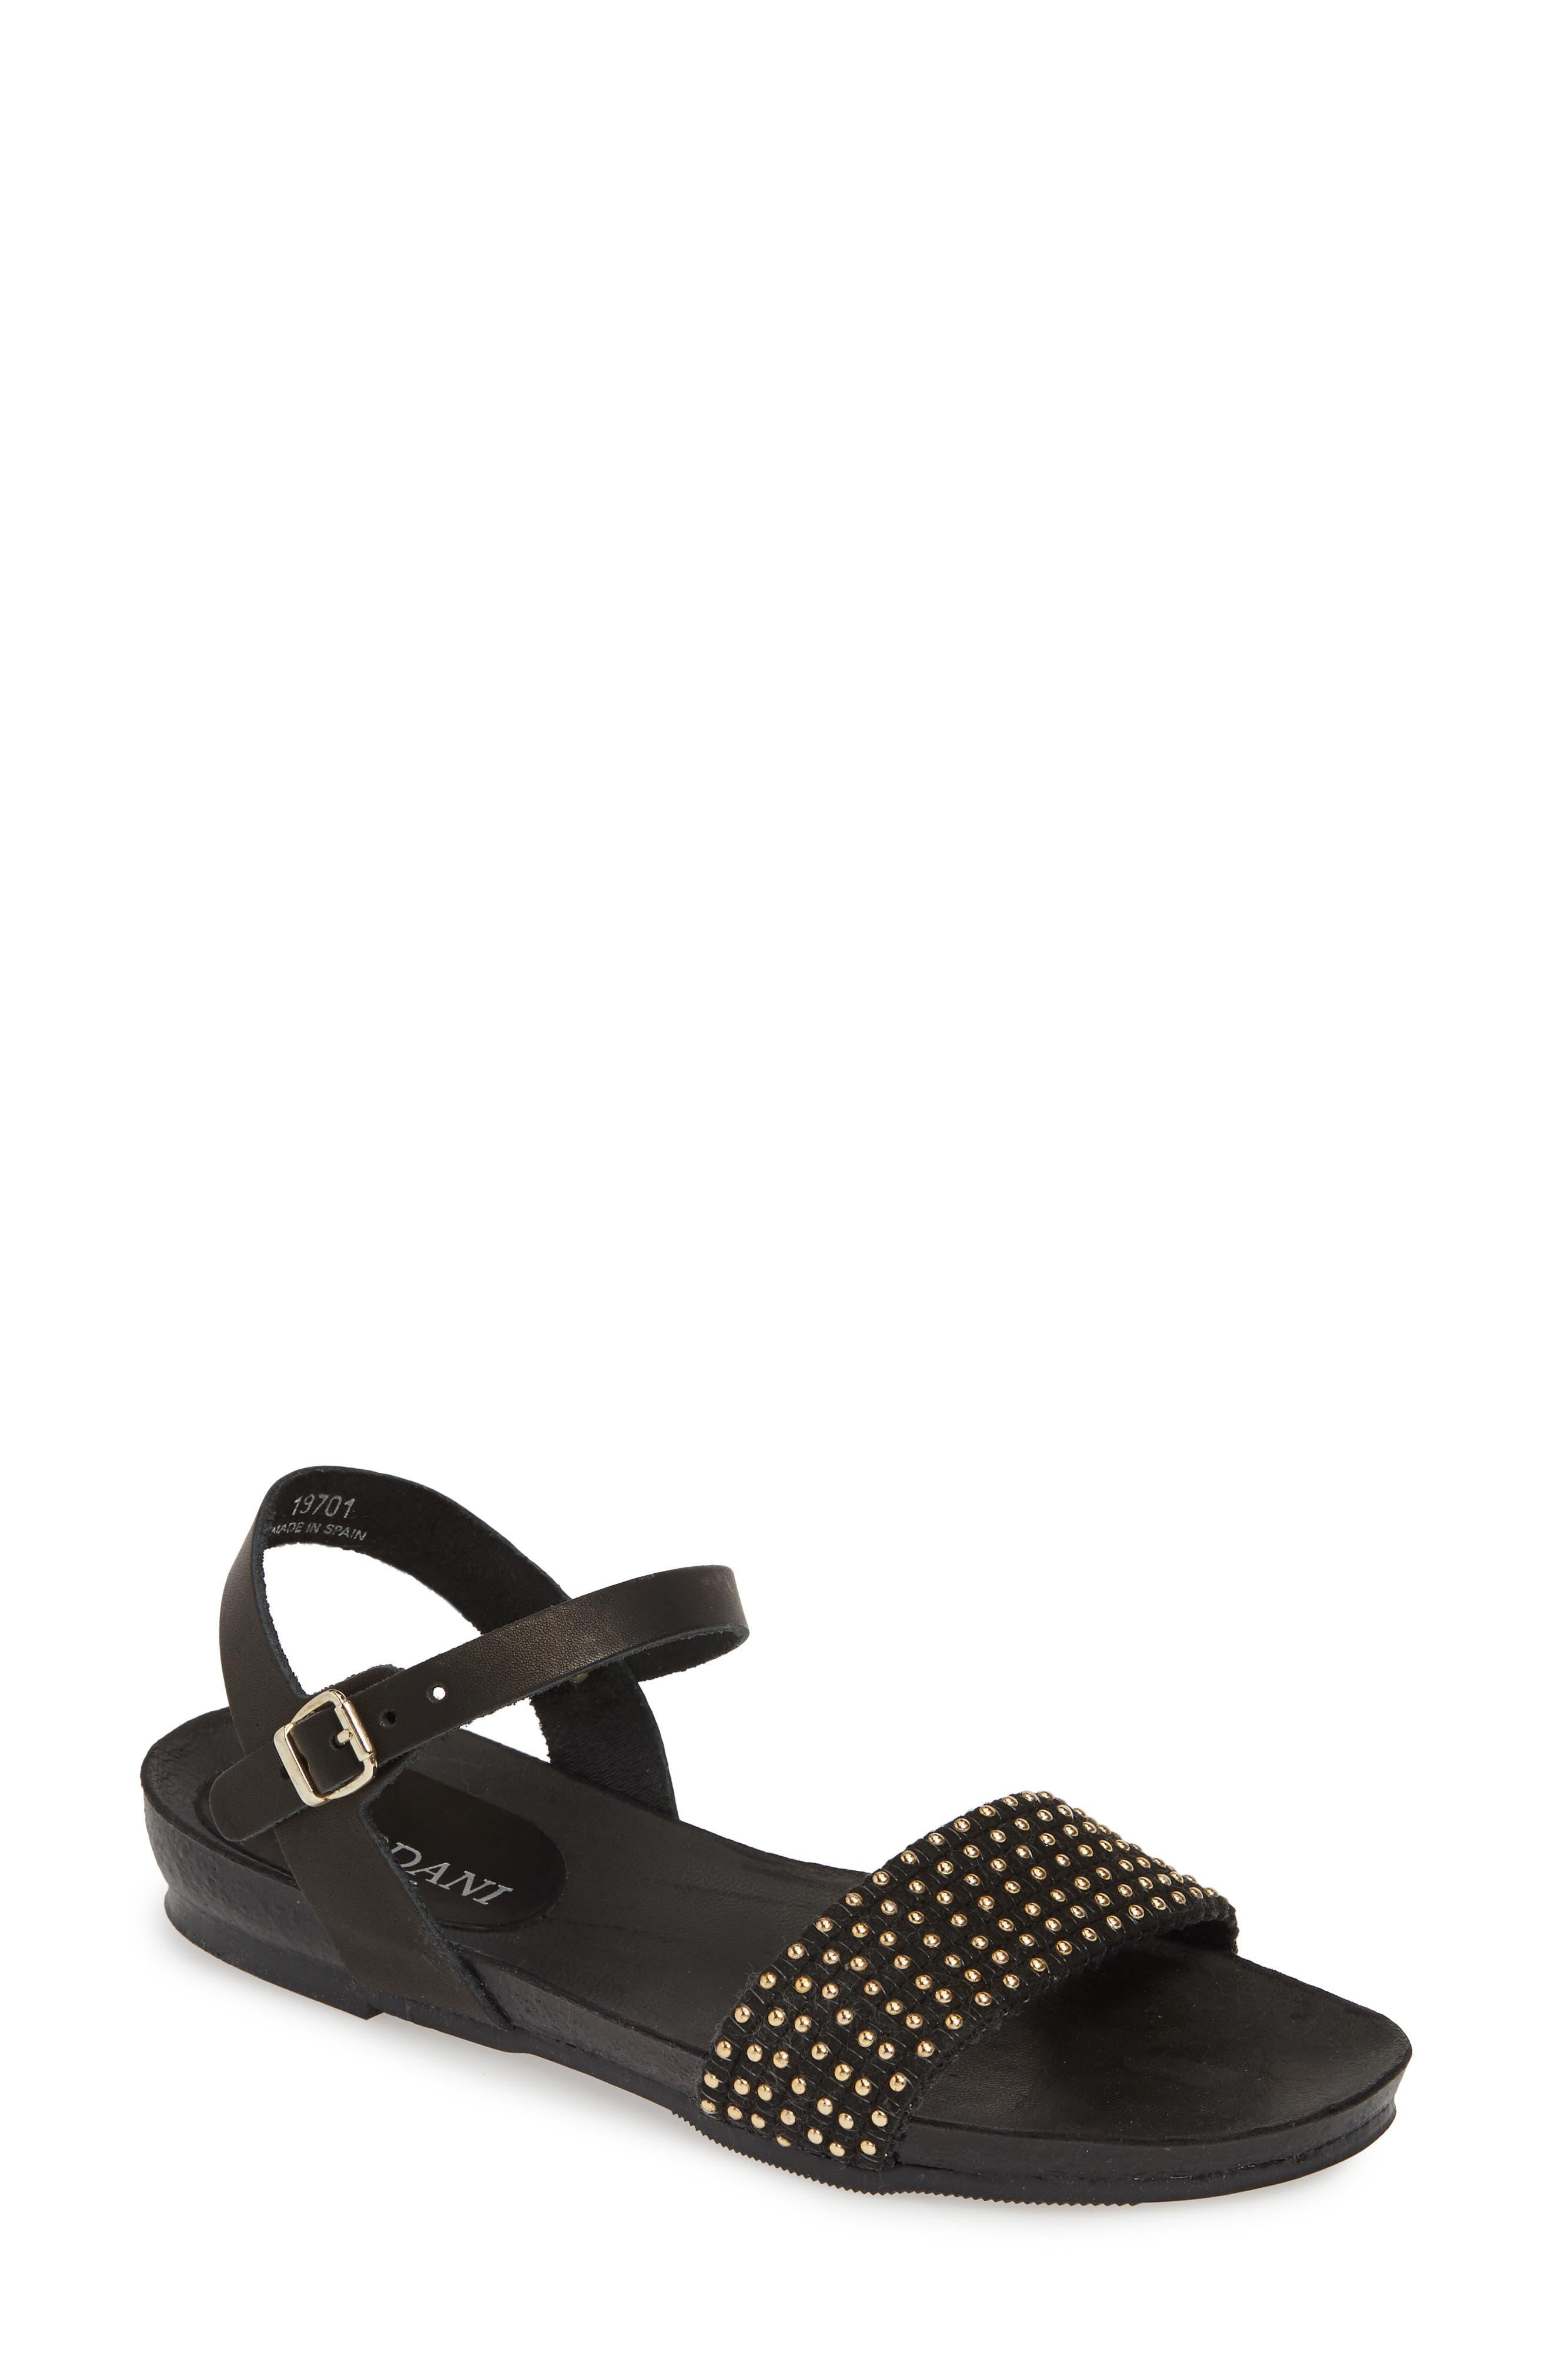 Cordani Sonya Studded Sandal - Black